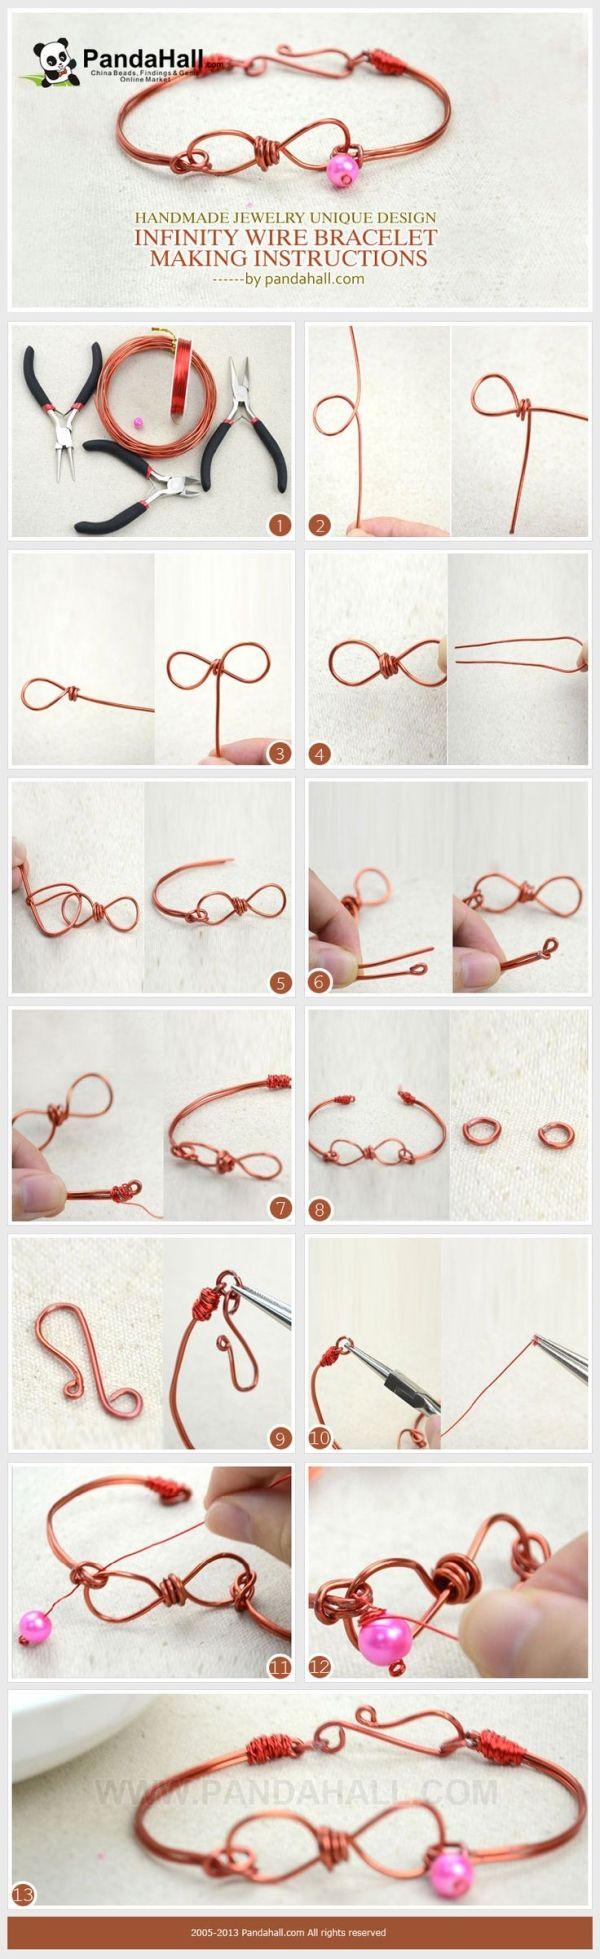 Handmade Jewelry Unique Design-Infinity Wire Bracelet Making ...